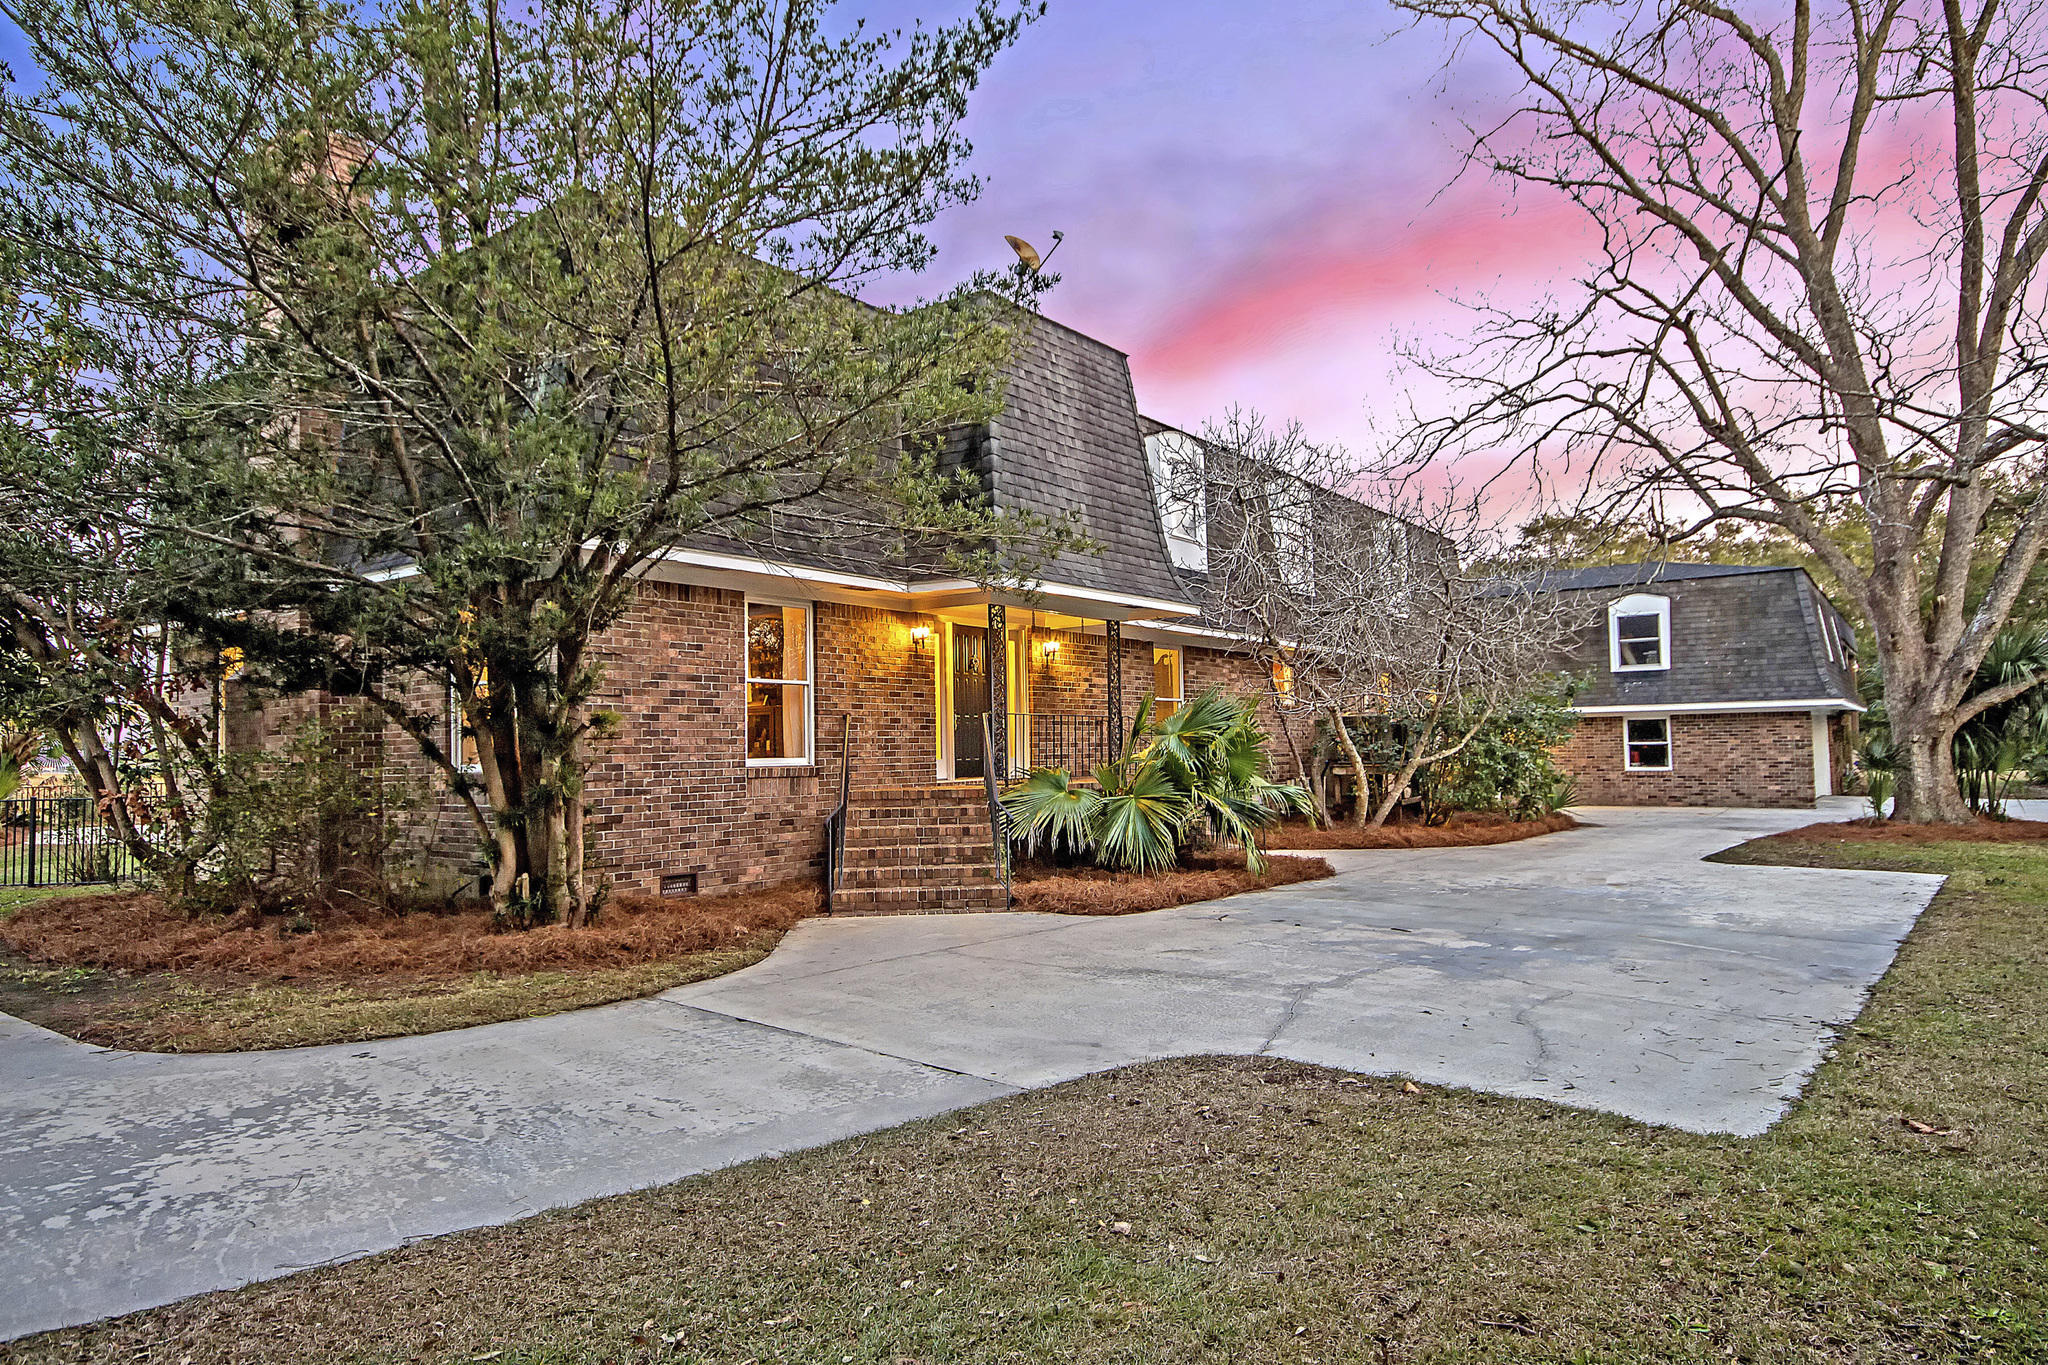 Lawton Bluff Homes For Sale - 608 Shore, Charleston, SC - 14